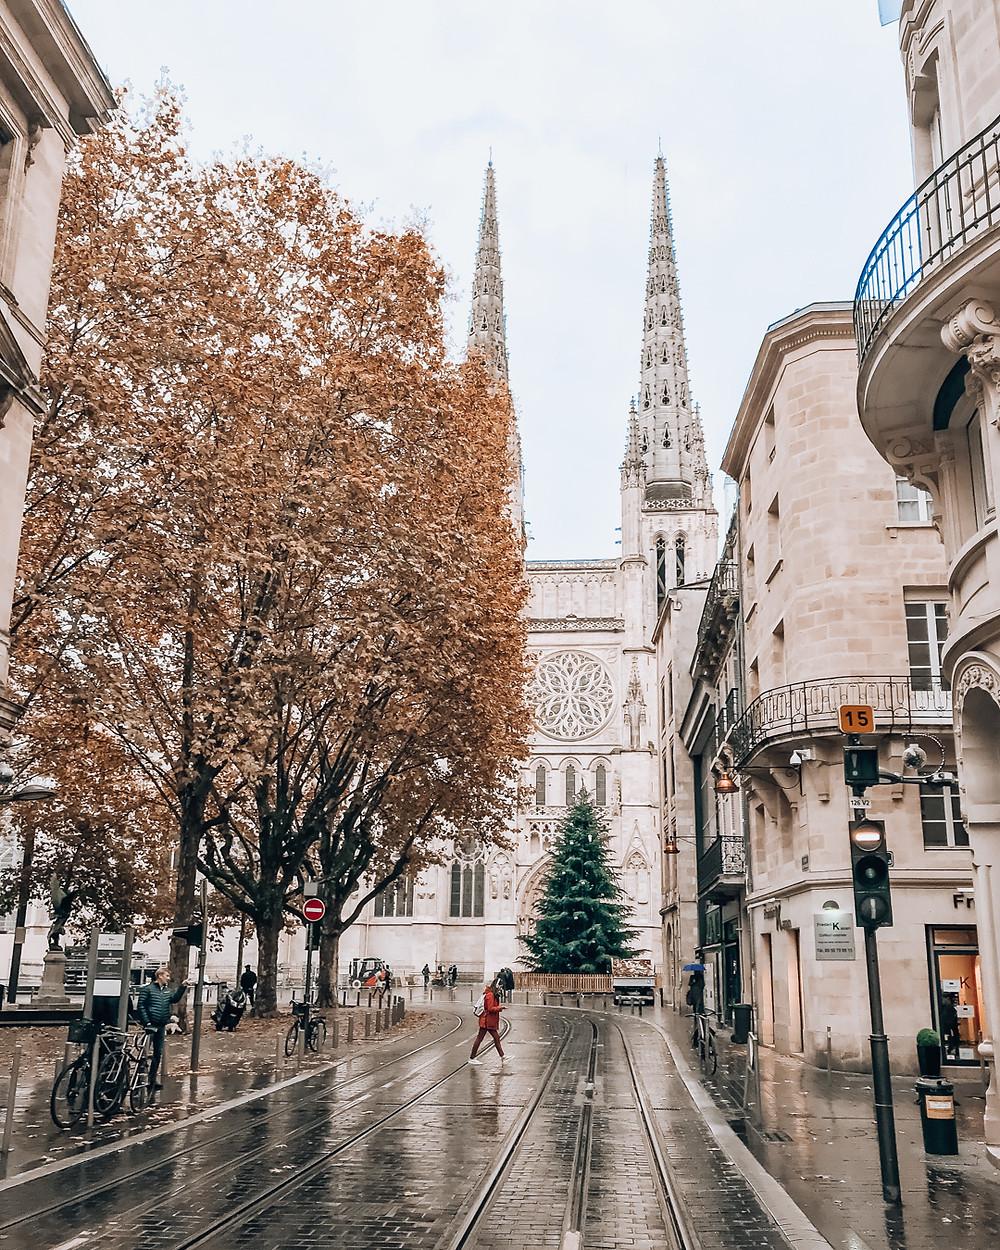 Cathedral Saint Andre Bordeaux France